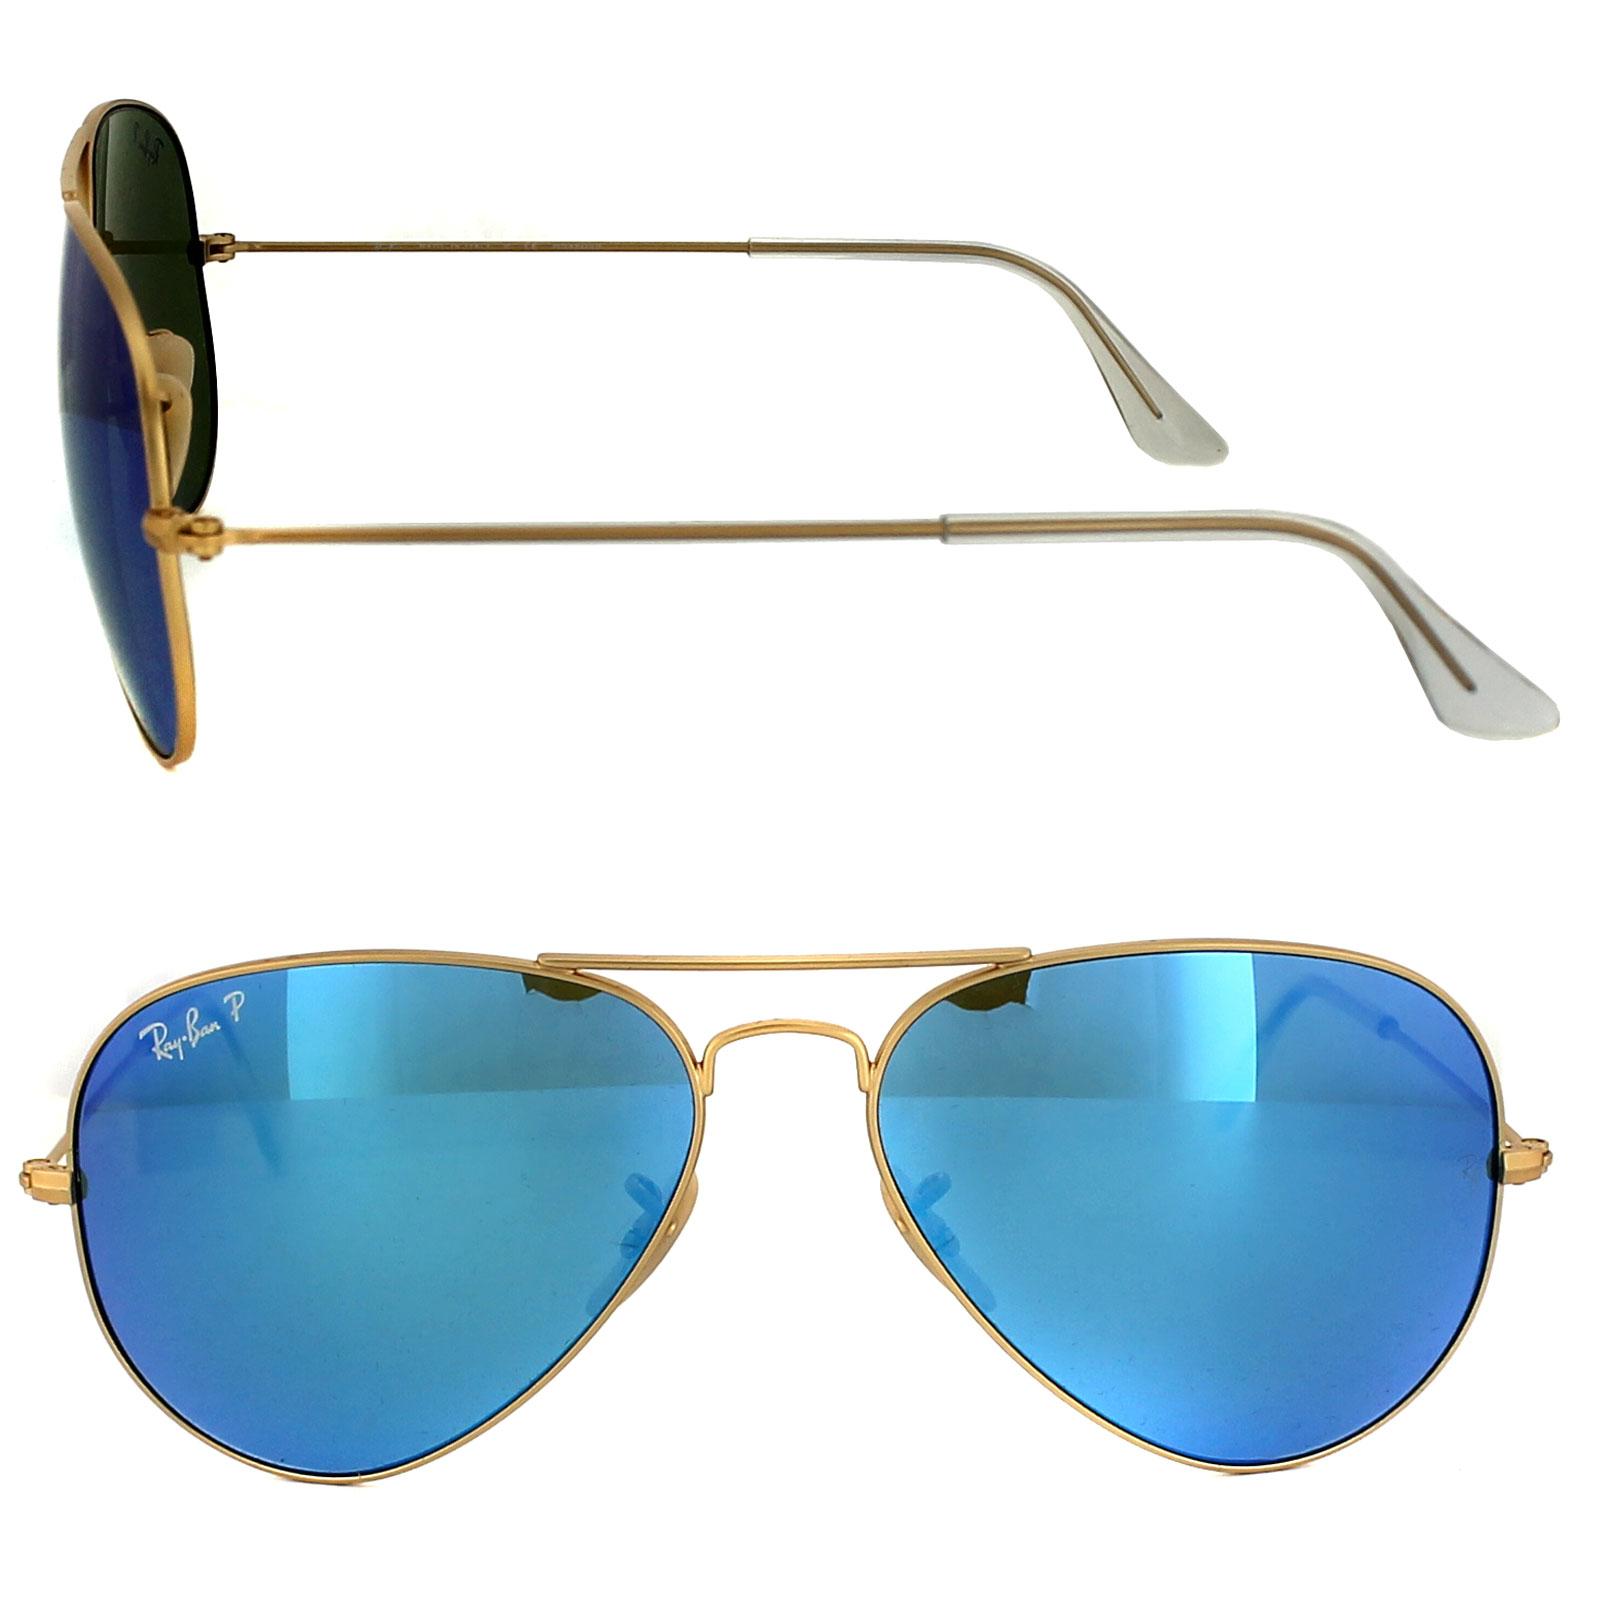 8095bd8b568c Blue Ray Ban Sunglasses Ebay